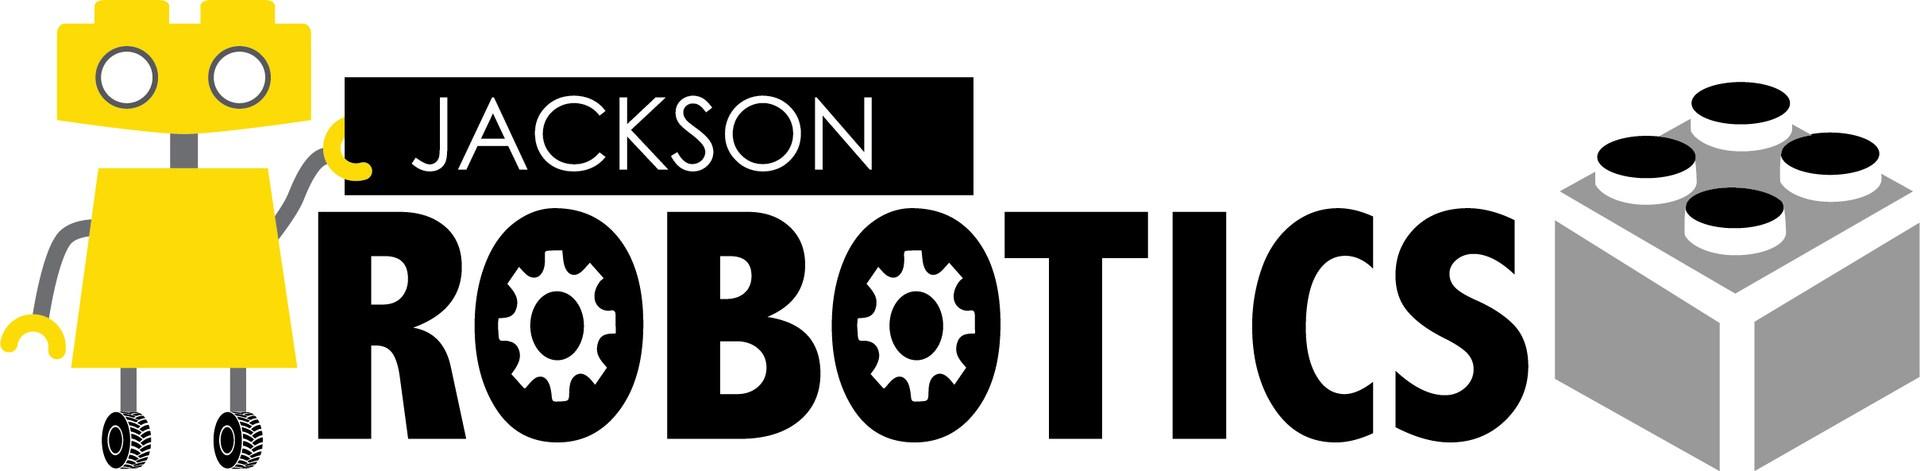 Jackson Elementary Robotics Logo